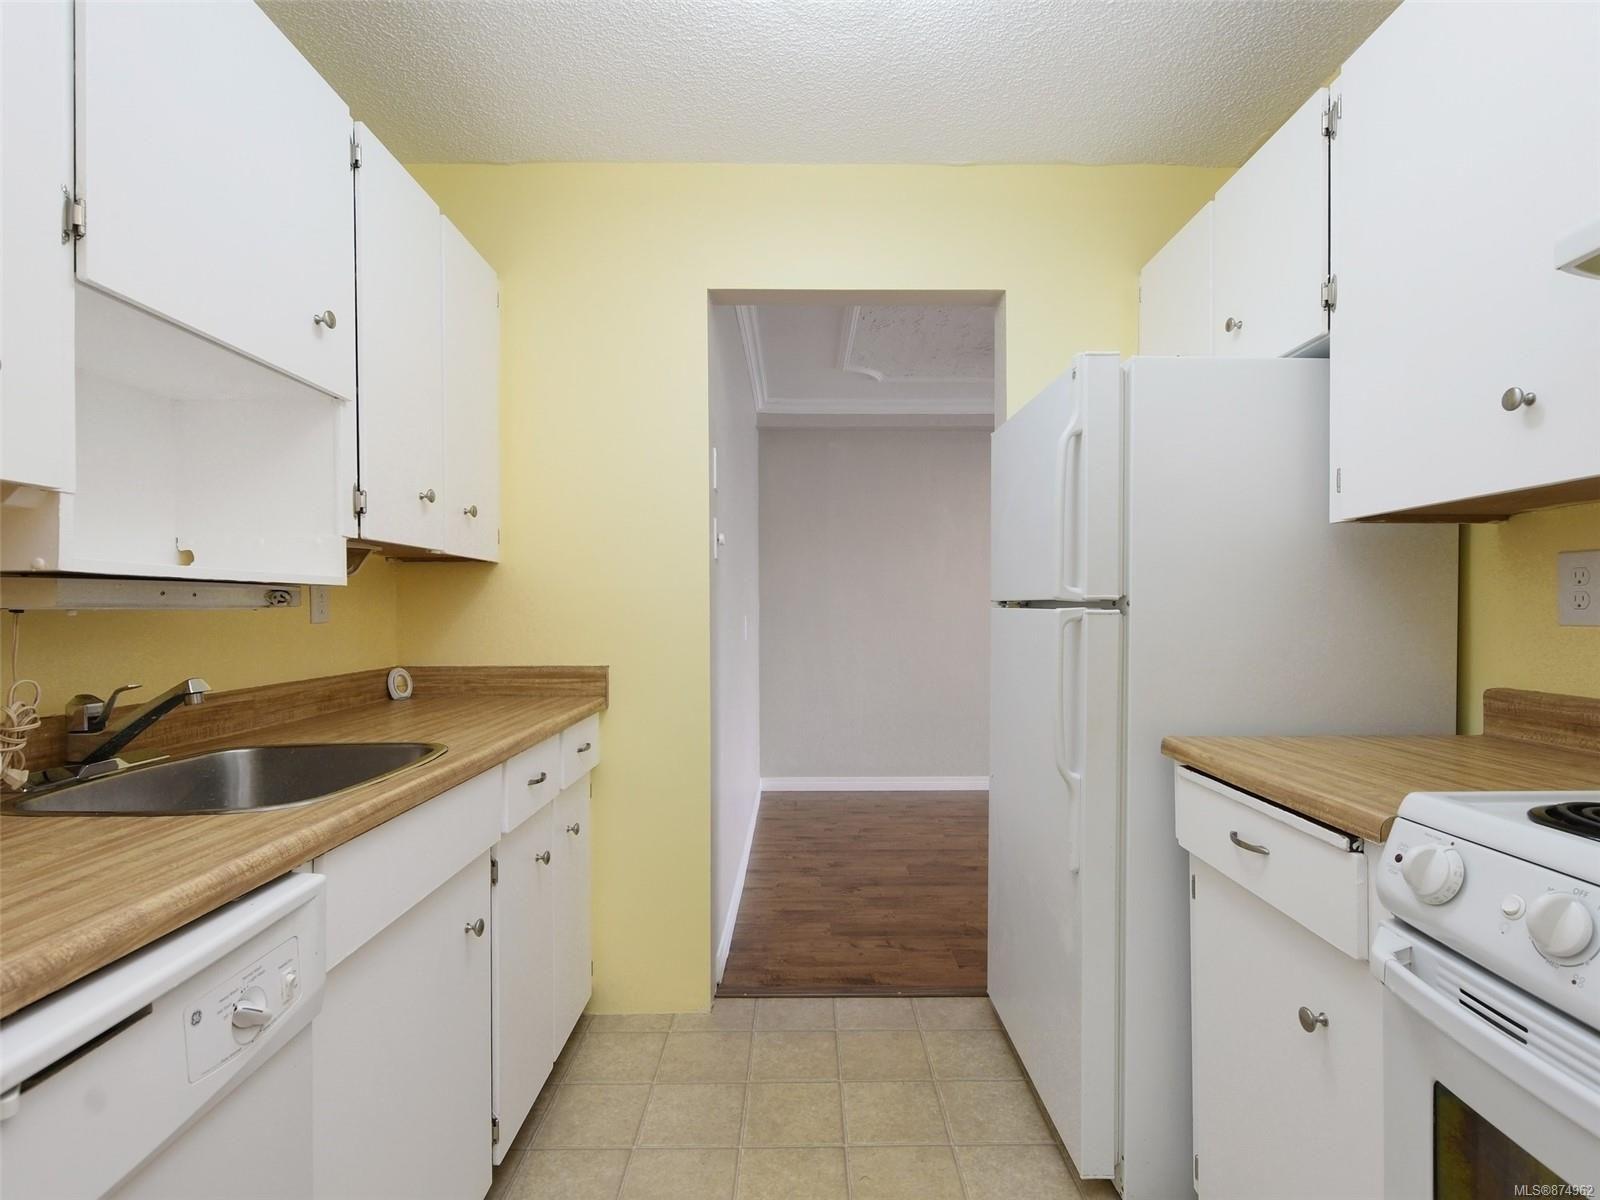 Main Photo: 118 1025 Inverness Rd in Saanich: SE Quadra Condo for sale (Saanich East)  : MLS®# 874962